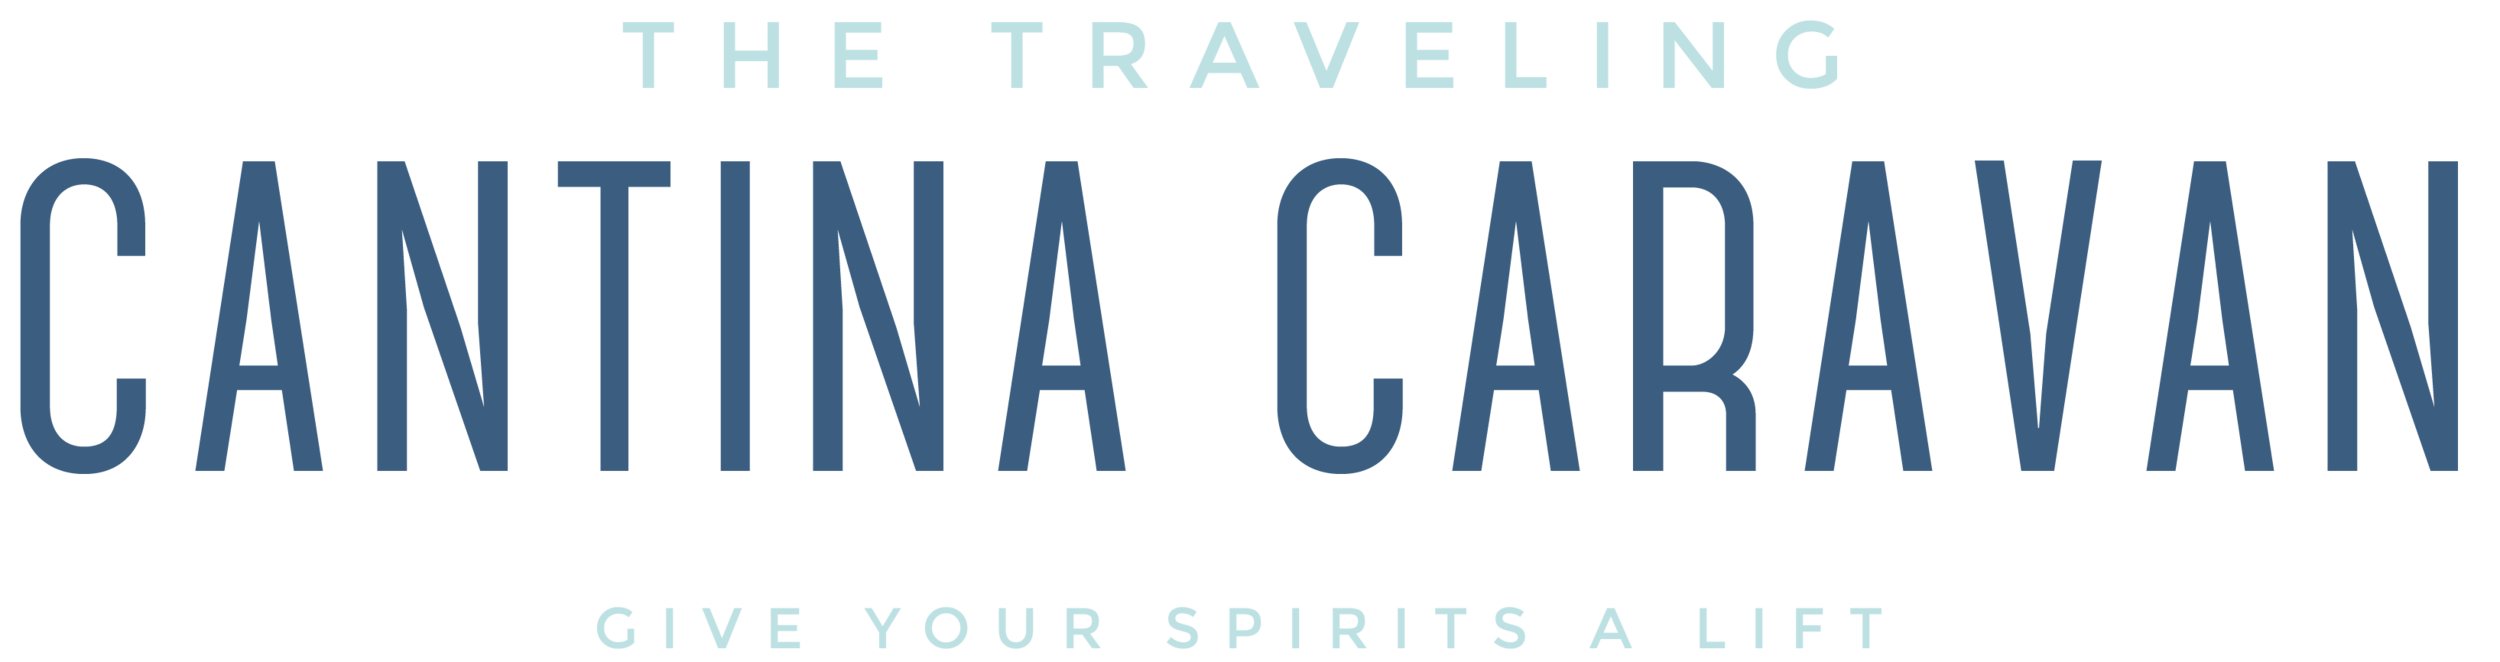 Cantina Caravan Secondary Logo